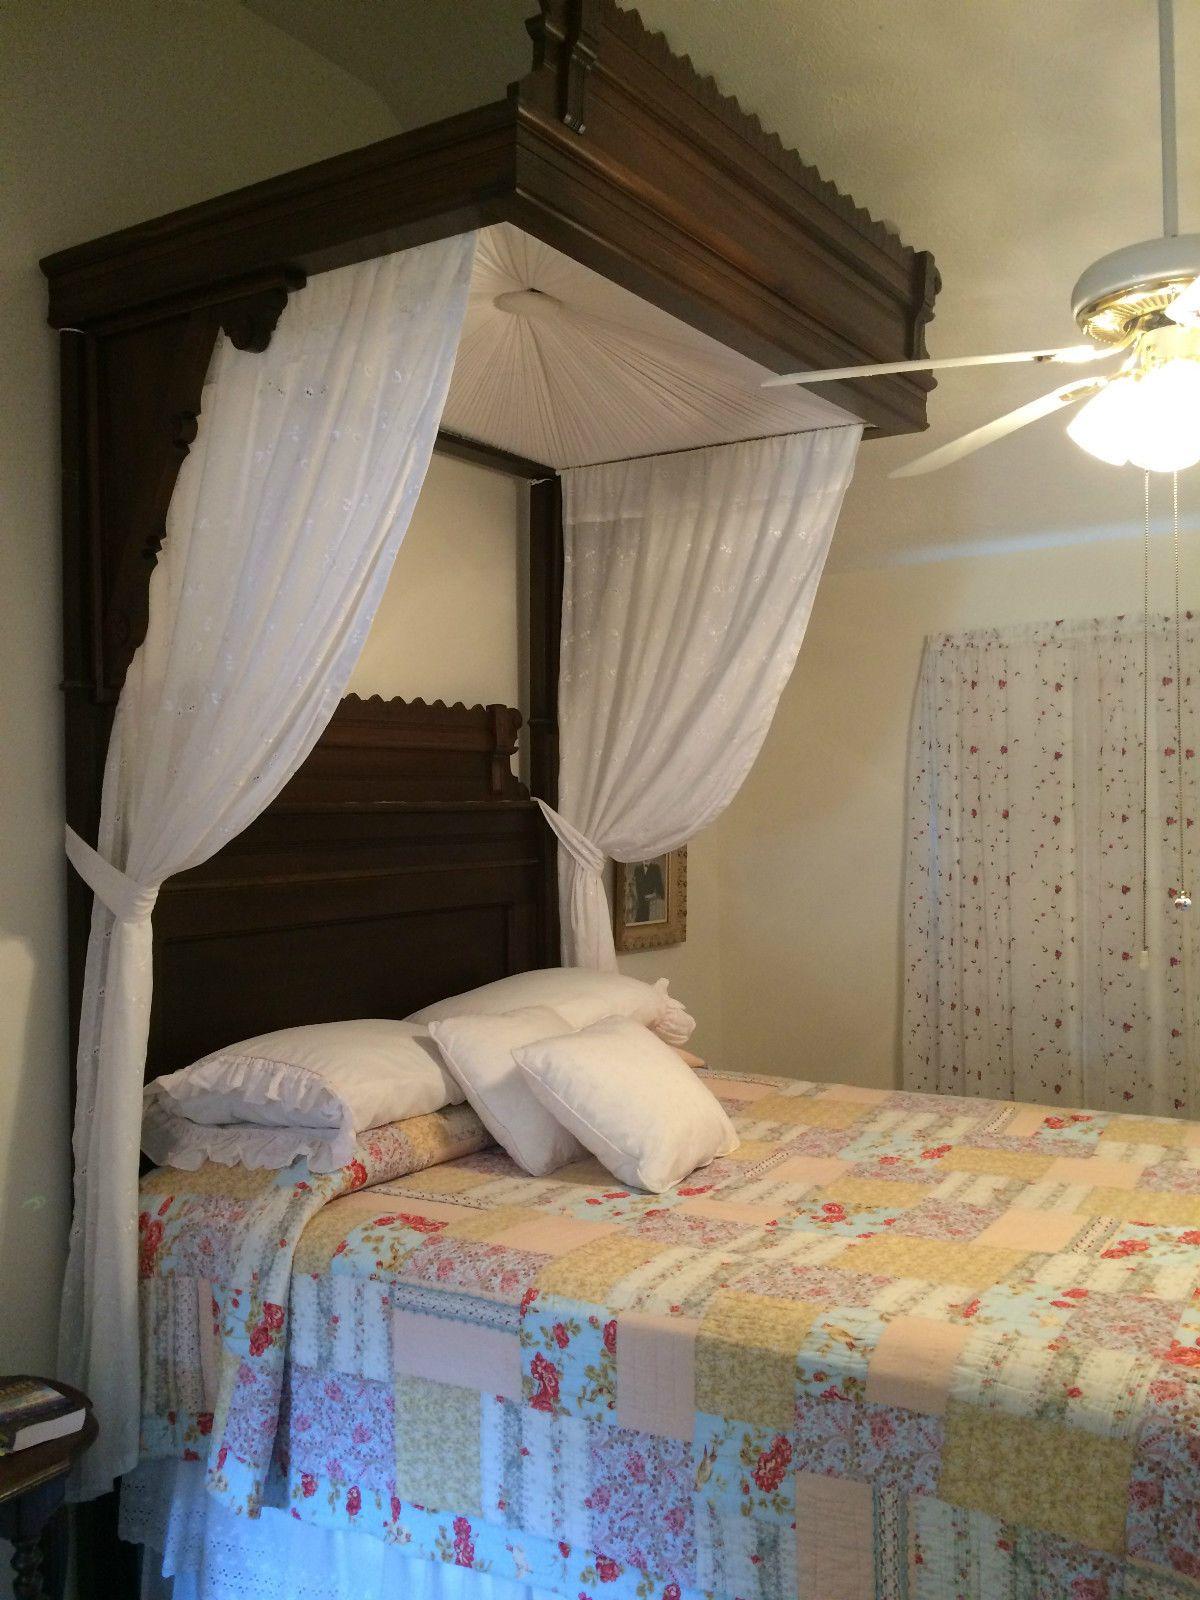 ANTIQUE EASTLAKE HALF TESTER BED APPROX. 11 FOOT TALL in Antiques Furniture Beds & ANTIQUE EASTLAKE HALF TESTER BED APPROX. 11 FOOT TALL in Antiques ...